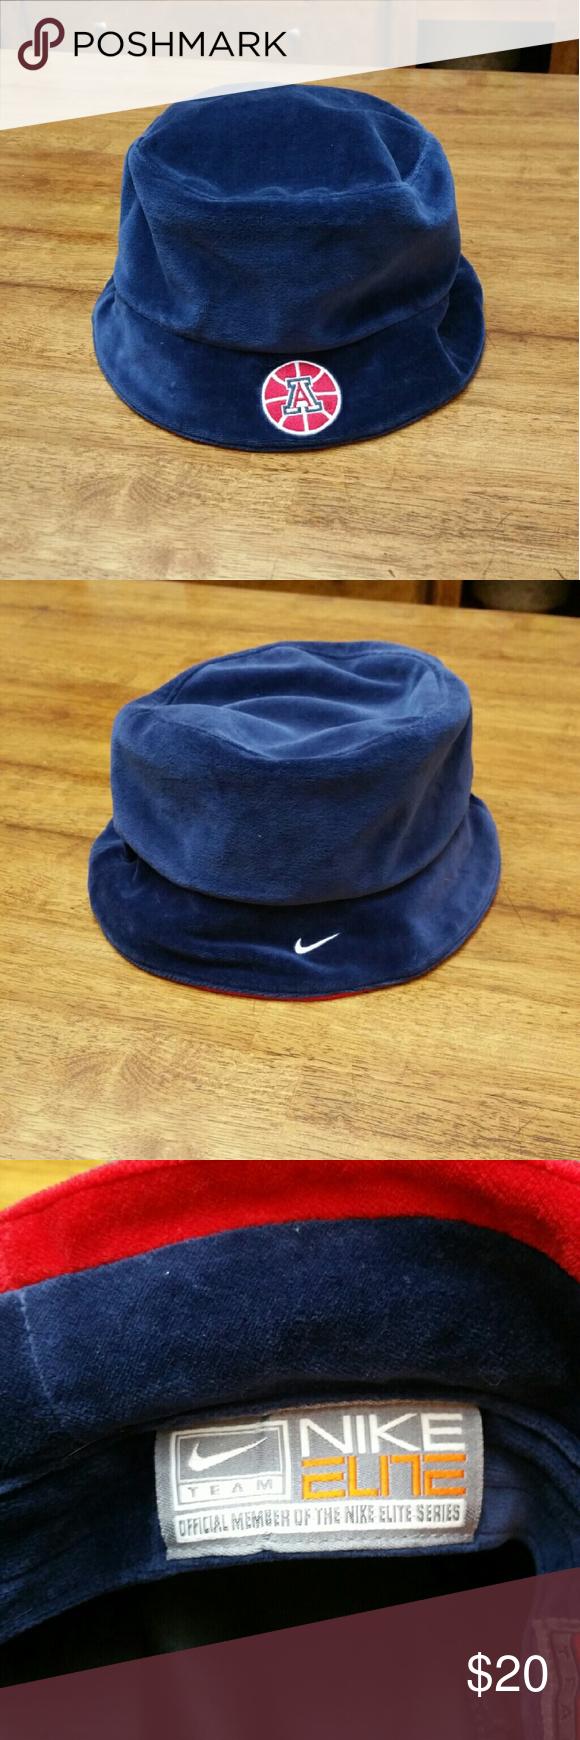 2937ec3db98 Mens Lg XLg Nike Velour UofA bucket hat Perfect for the University of  Arizona basketball fan! Nike Accessories Hats